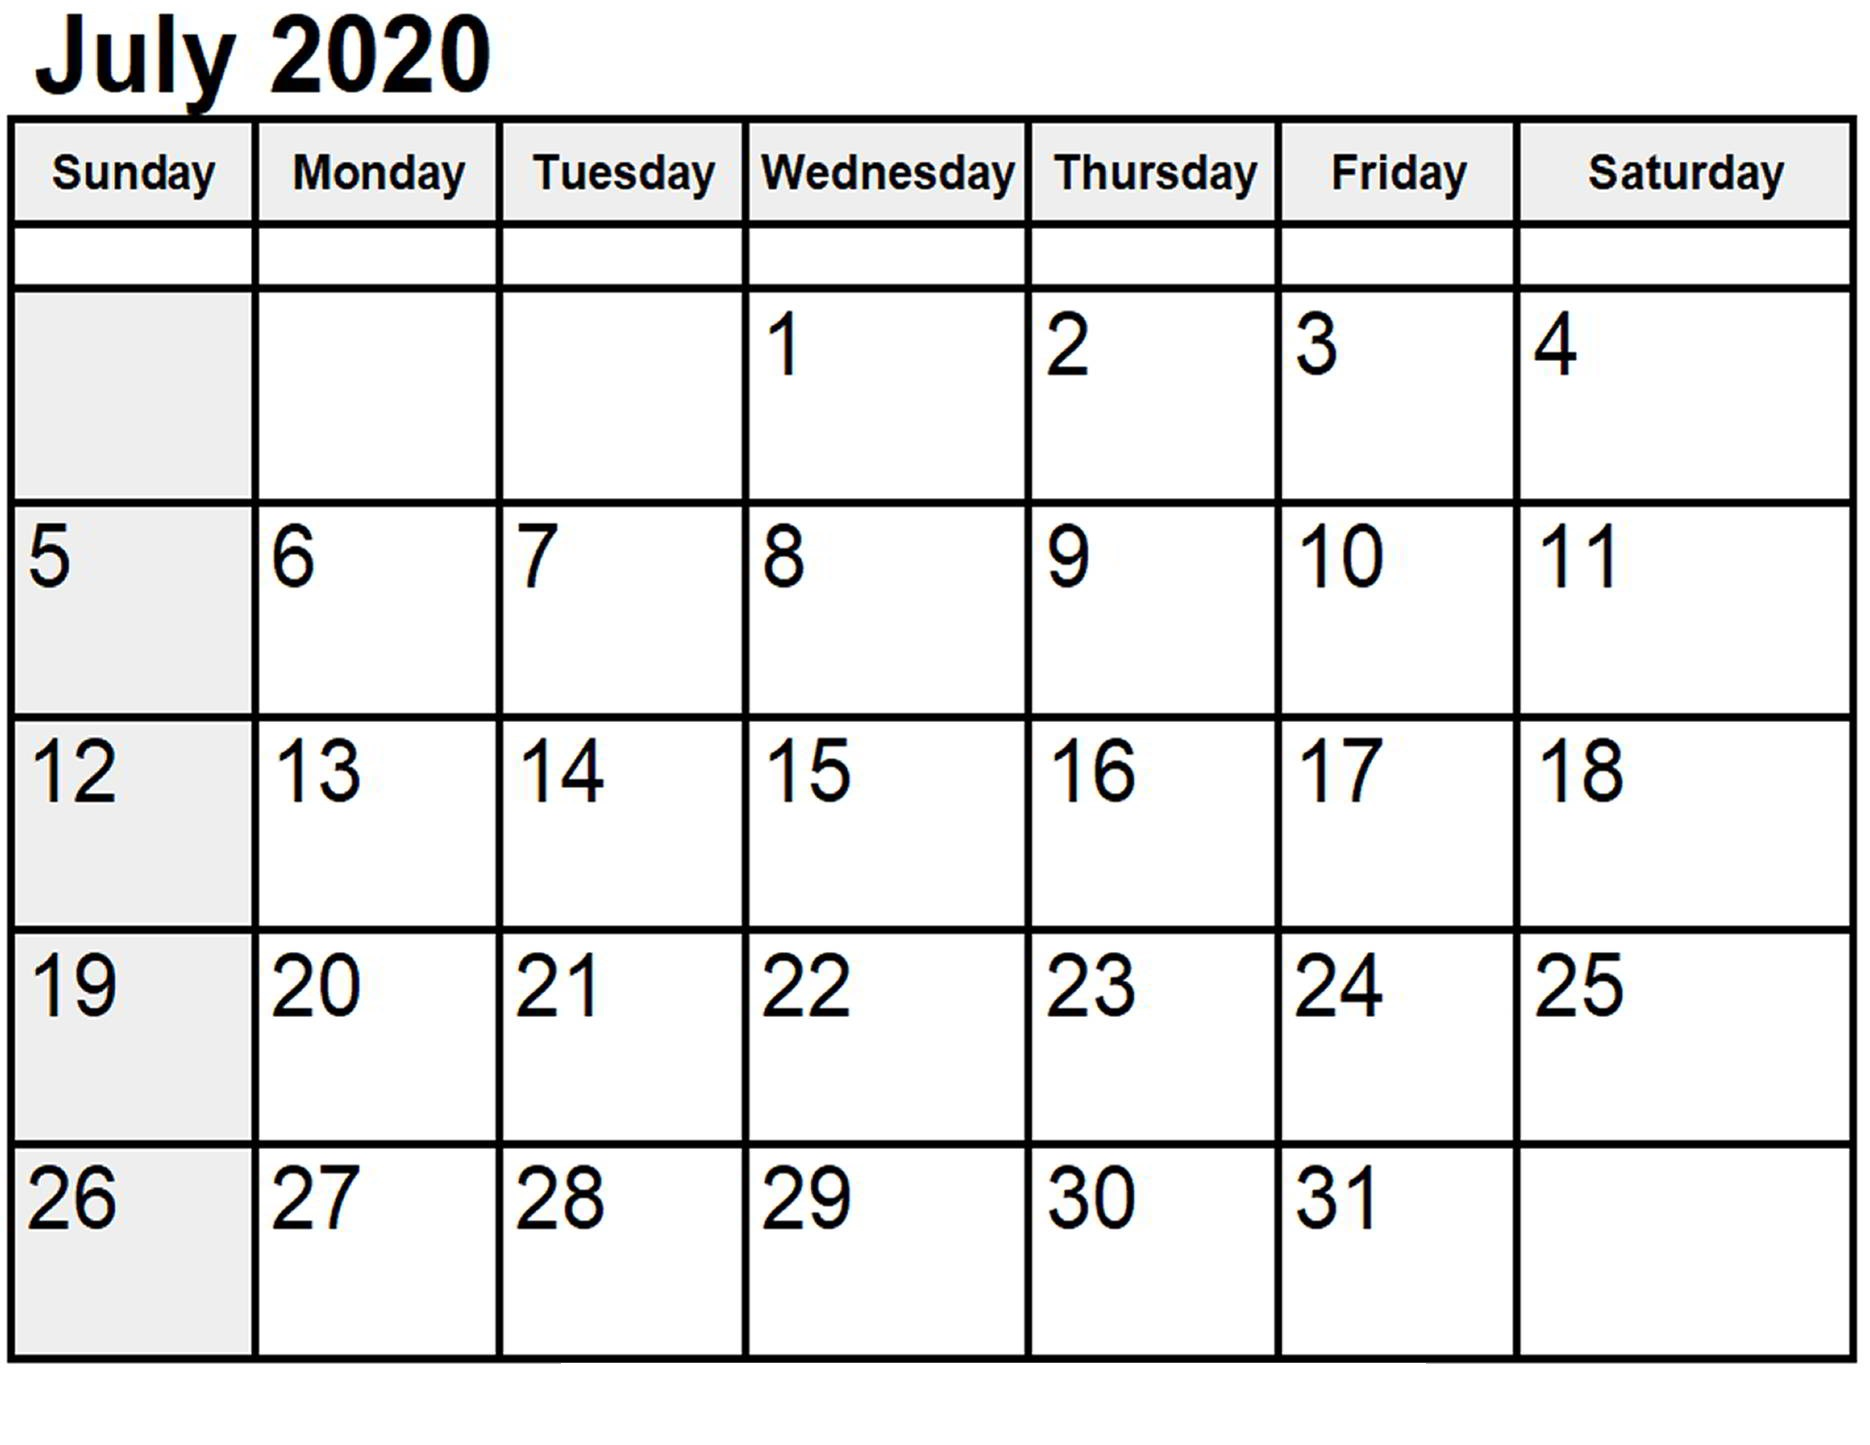 July 2020 Printable Calendar Free